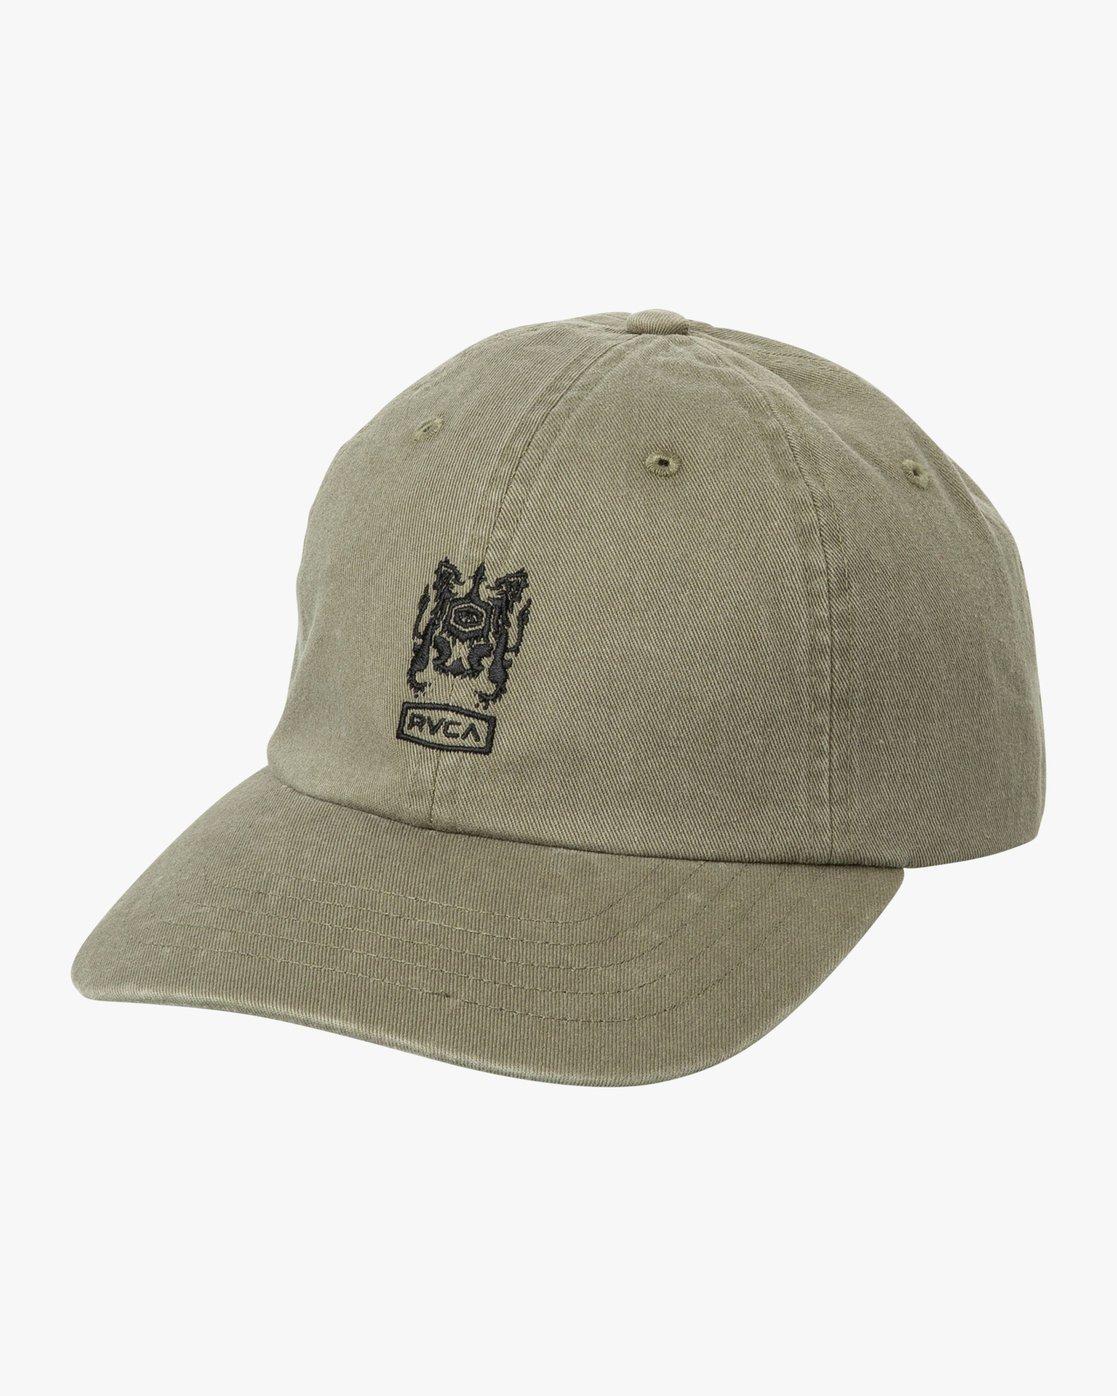 0 Crest Strapback Hat Green MAHWURCC RVCA